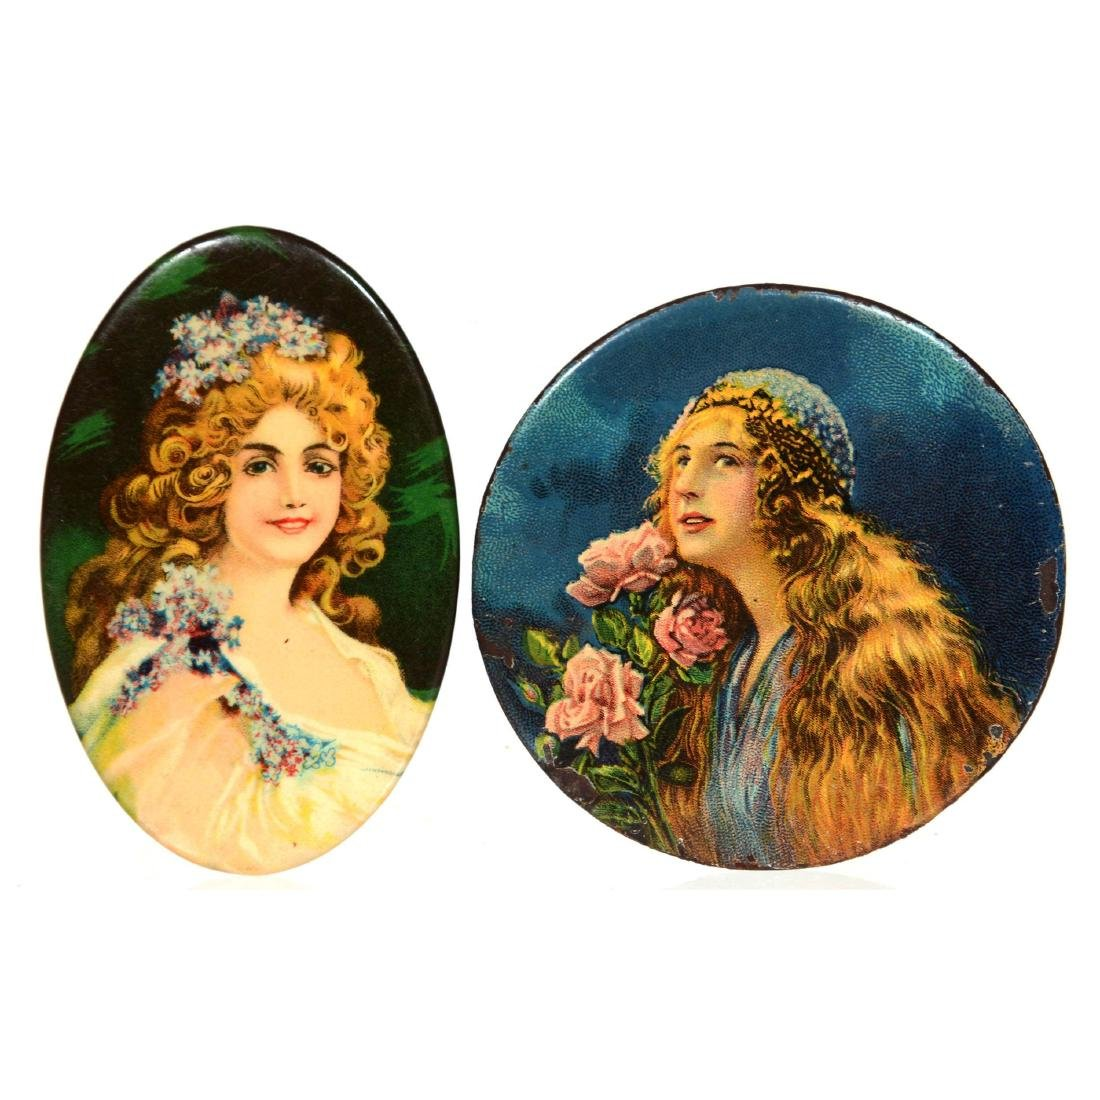 (2) Original Pocket Mirrors